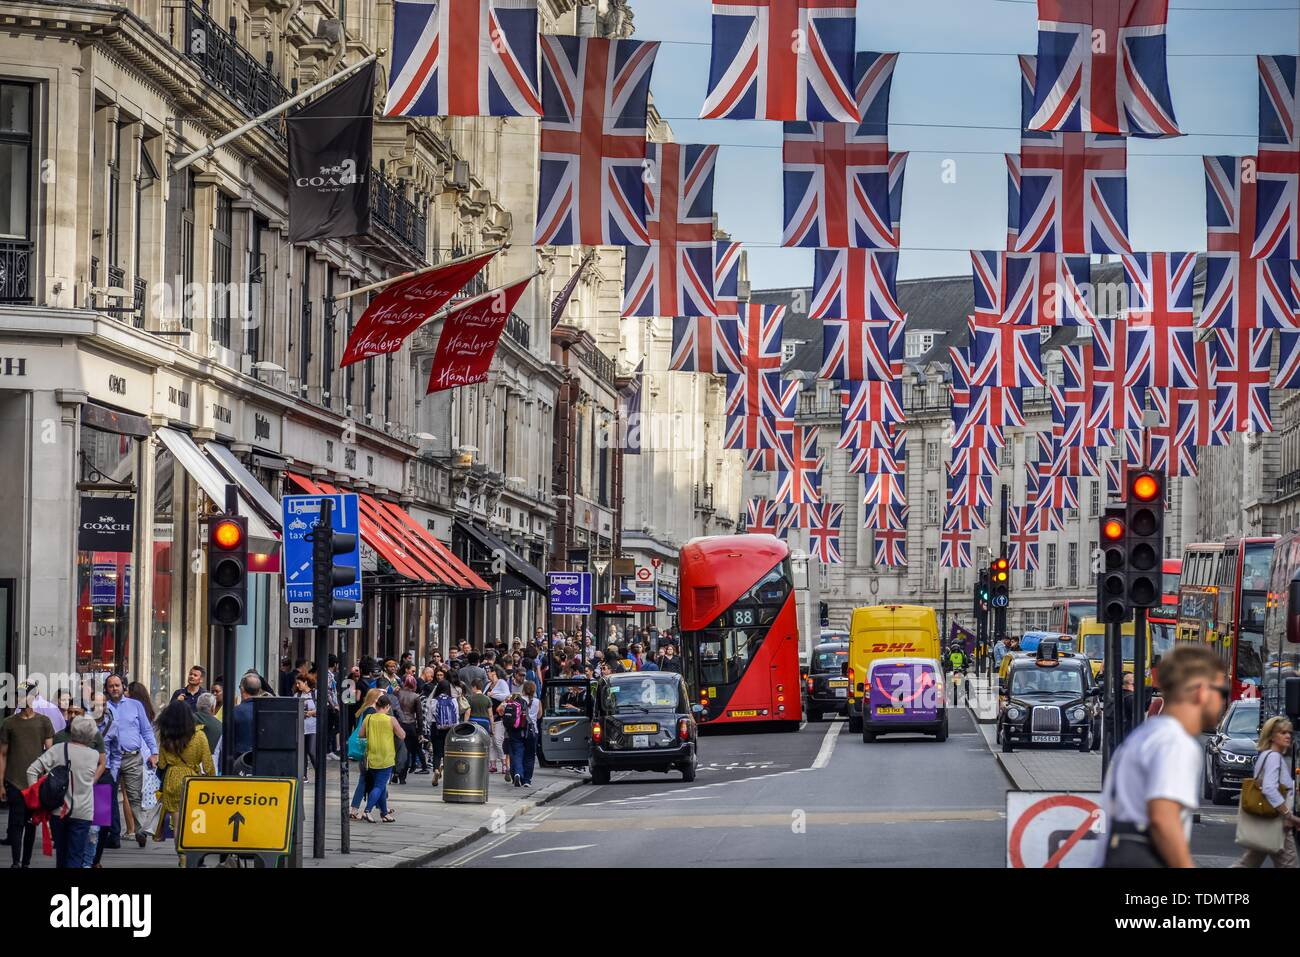 Busy street with many British flags, street scene, Regent St, London, England, United Kingdom - Stock Image